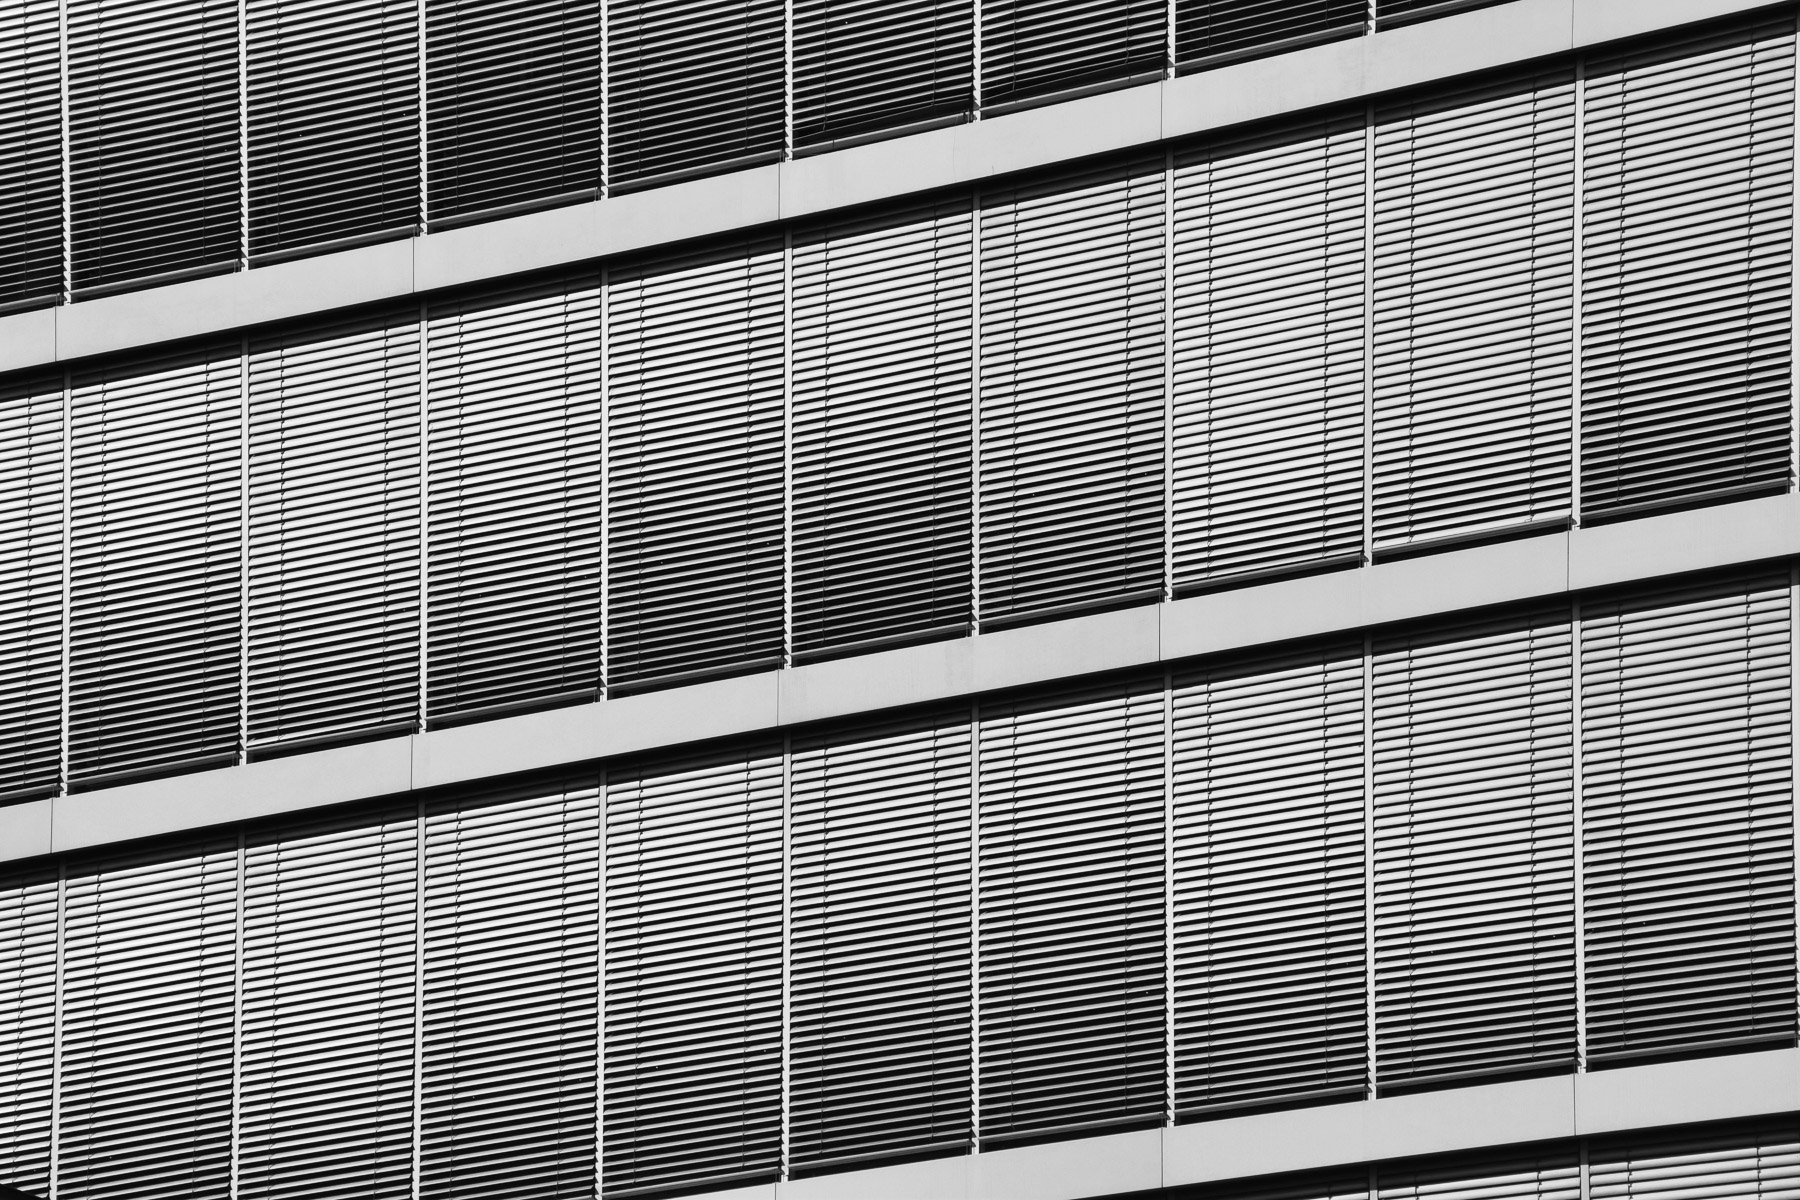 Fensterlinien (Foto: Peter Stollenmayer)